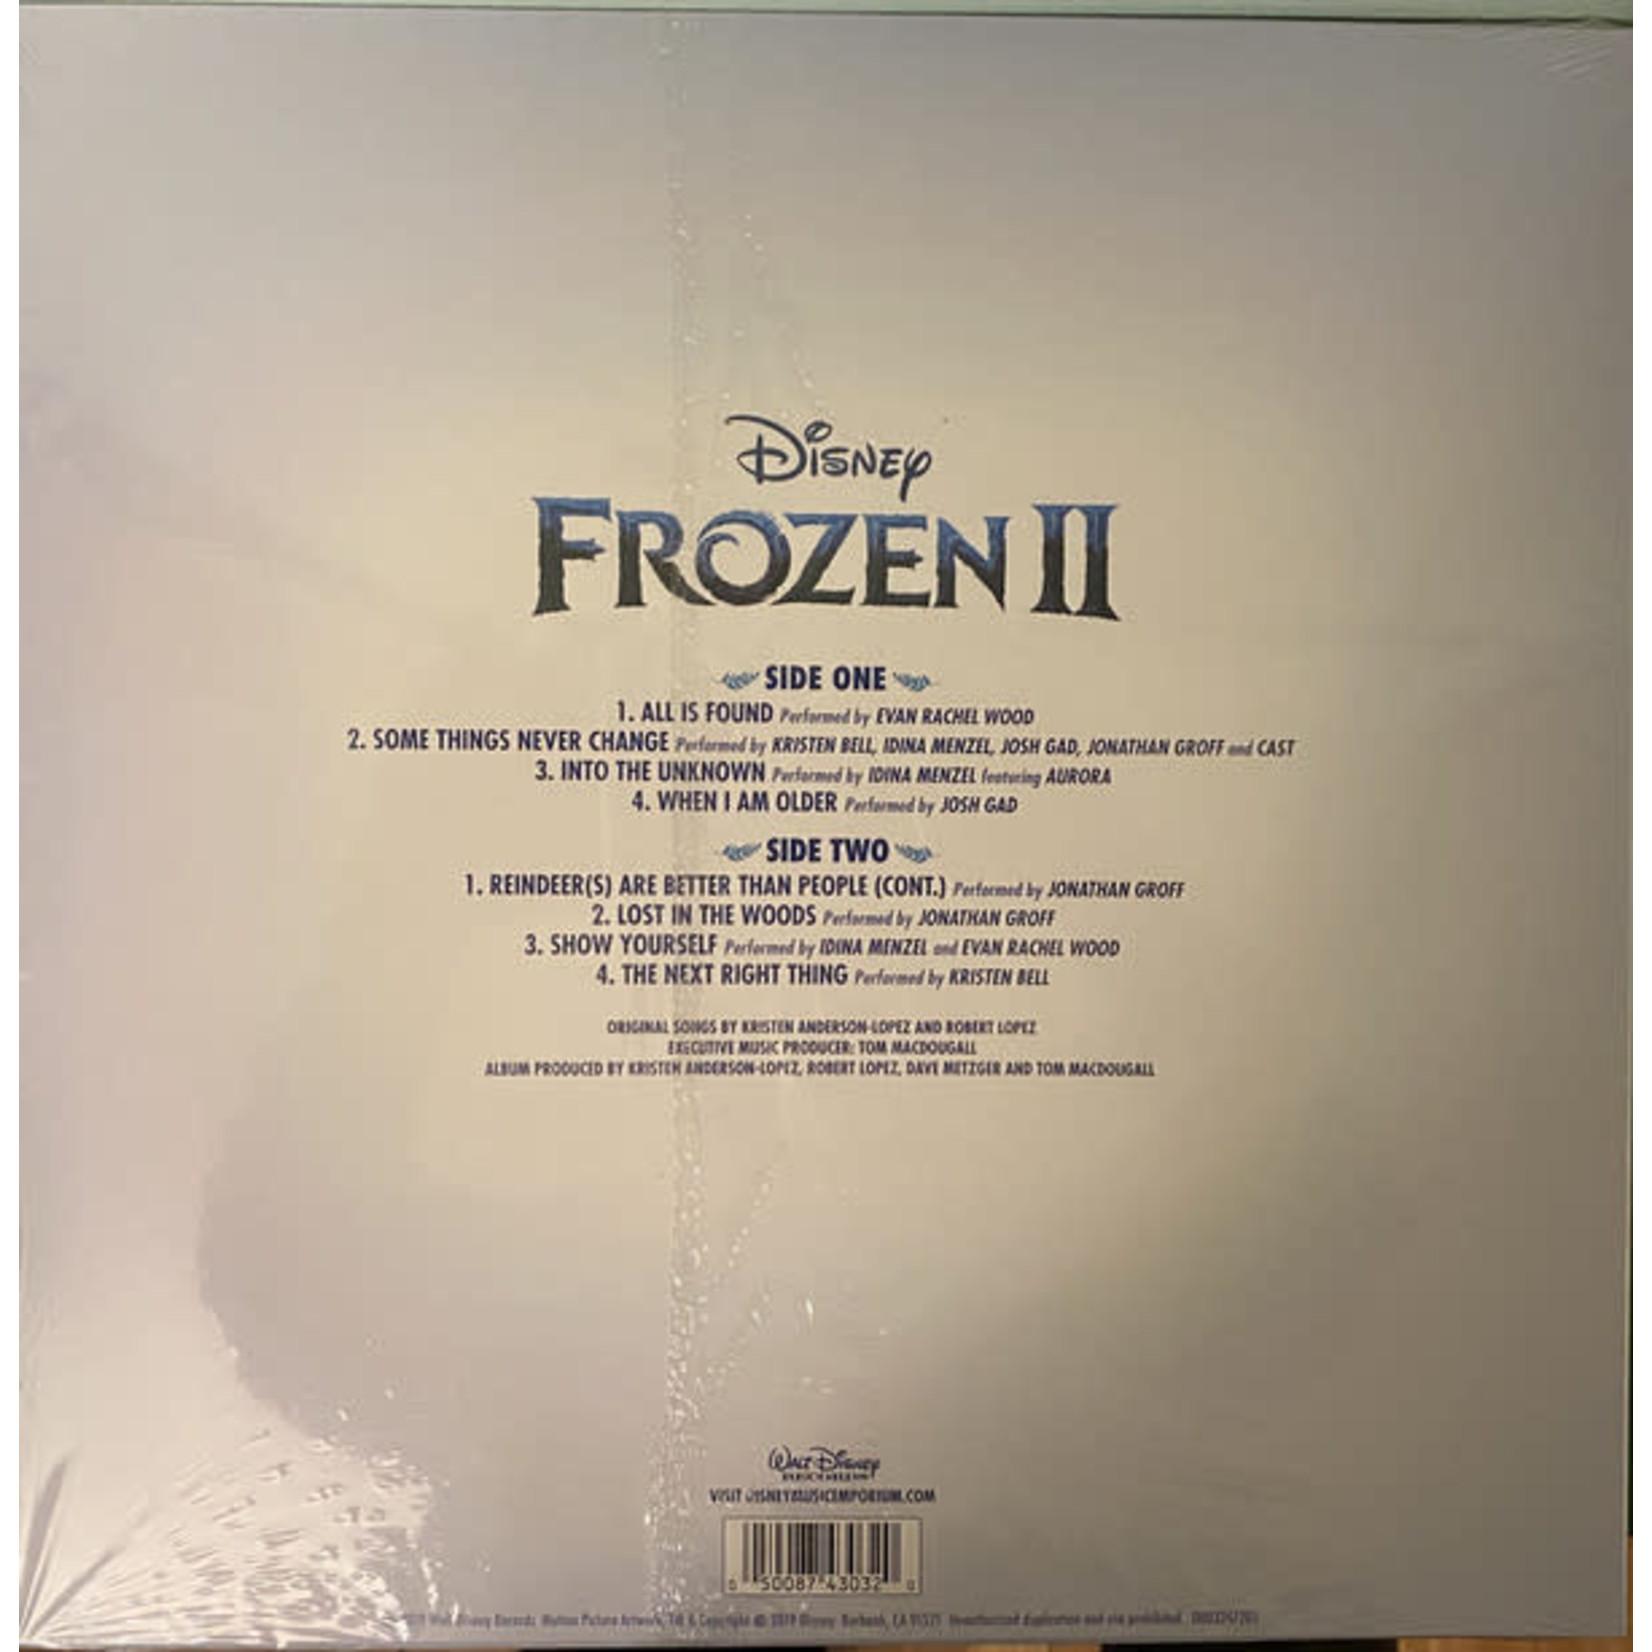 VARIOUS ARTISTS FROZEN 2: THE SONGS (LP)